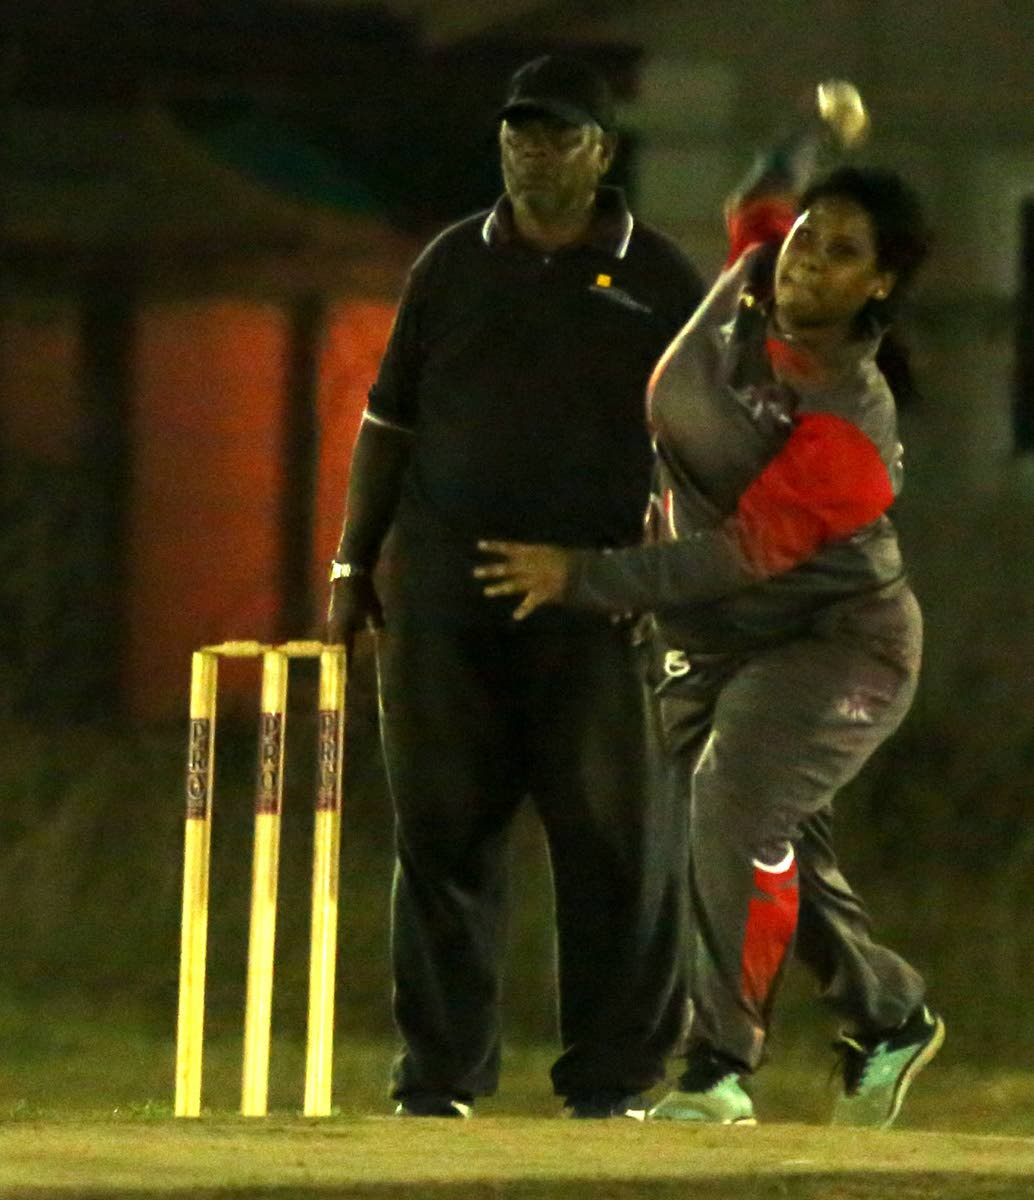 Cricket Divas' Makhila Superville bowls against Players Sports in a premiership division match at Avidesh Samaroo Park, Endeavour. PHOTO BY VASHTI SINGH